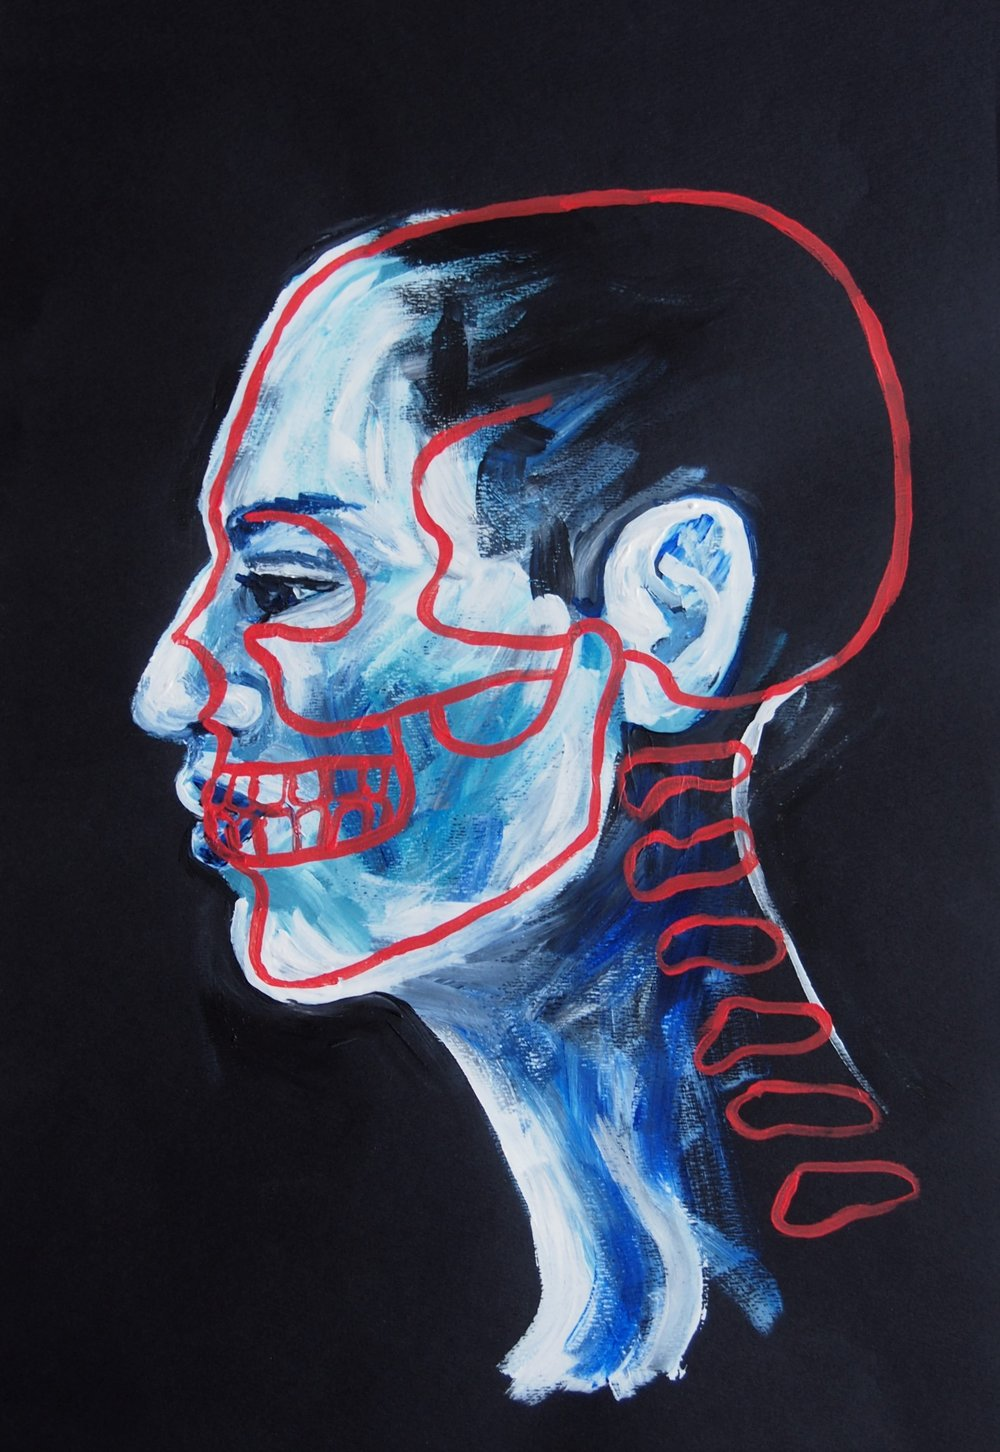 SELF PORTRAIT, Acrylic, 2018